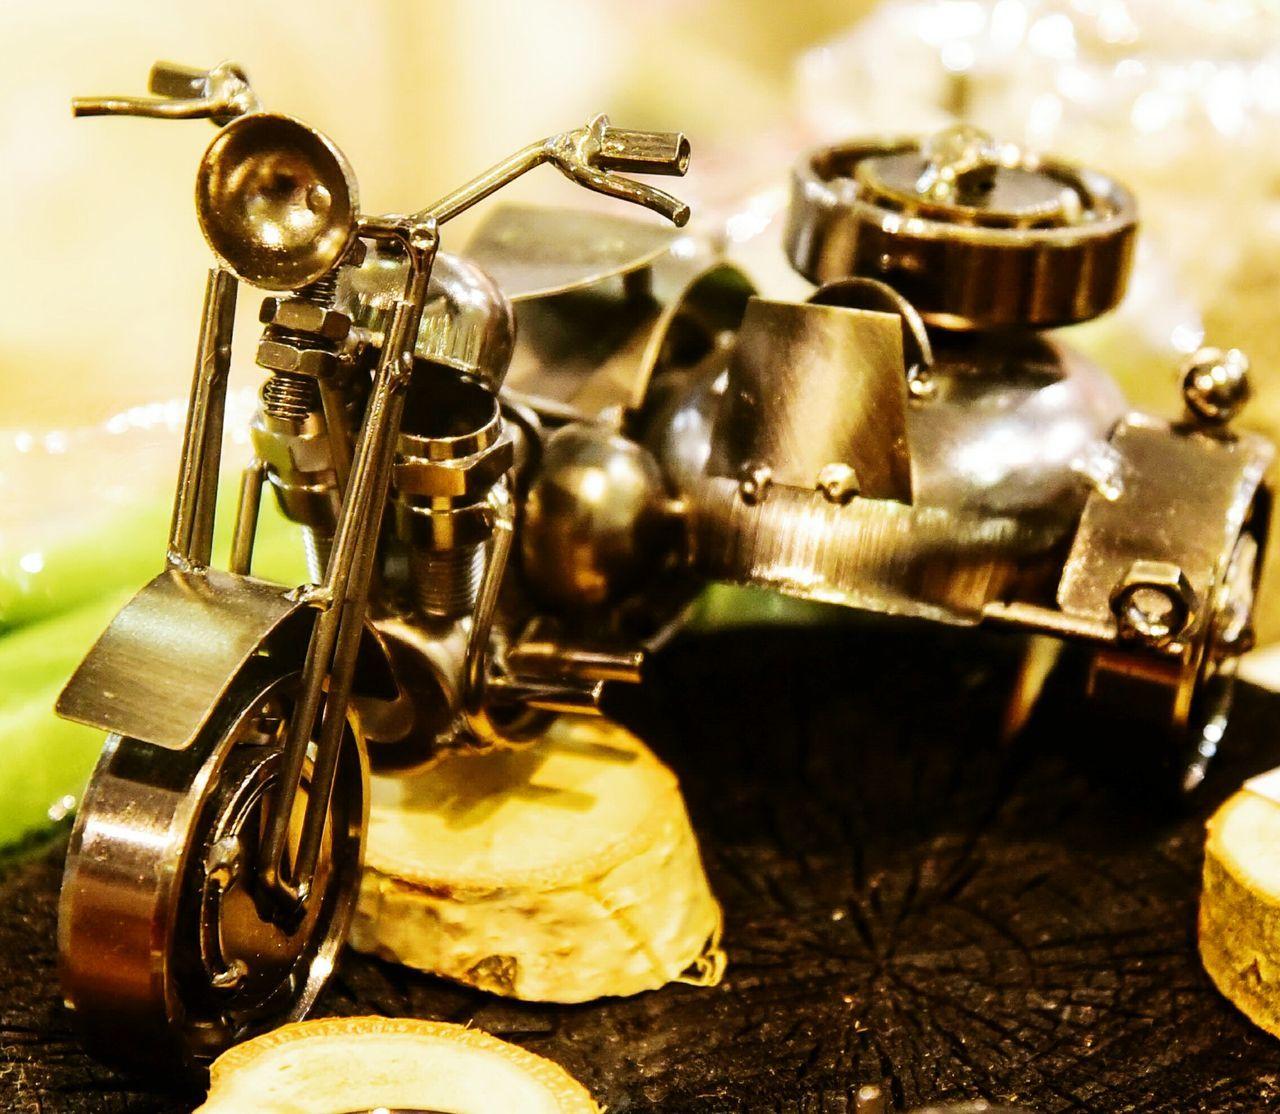 Metal Moto Motocross Motorcycles металл мотоцикл ручнаяработа поделка сувенир